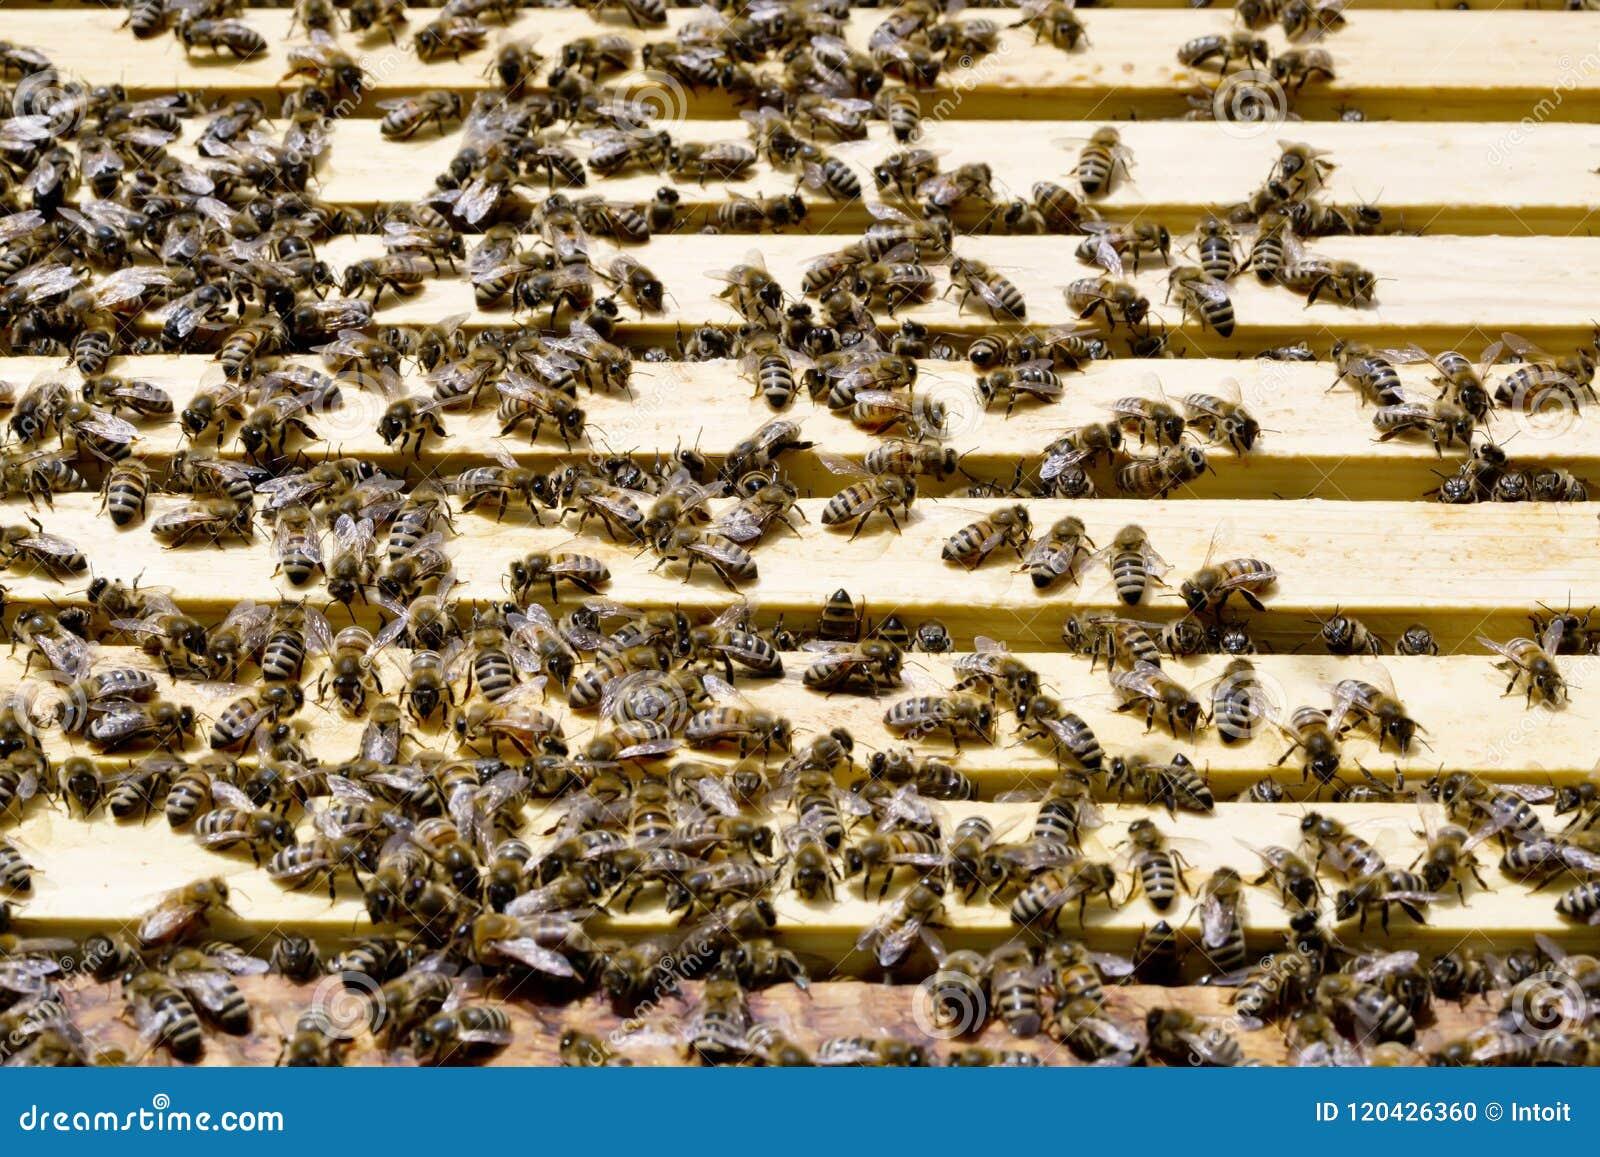 Colony of Honey Bees